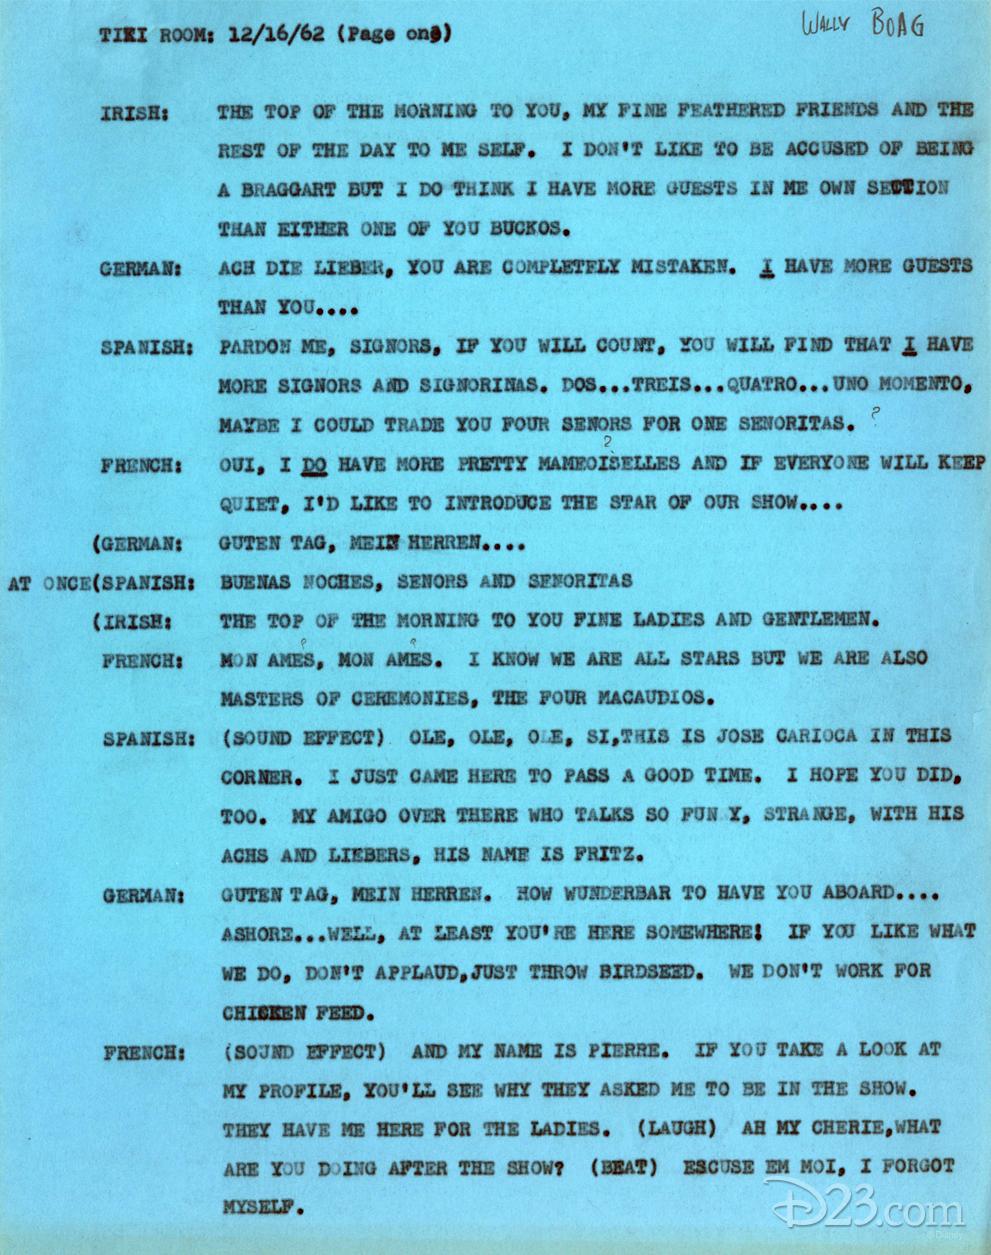 An Early Script for Walt Disney's Enchanted Tiki Room - D23